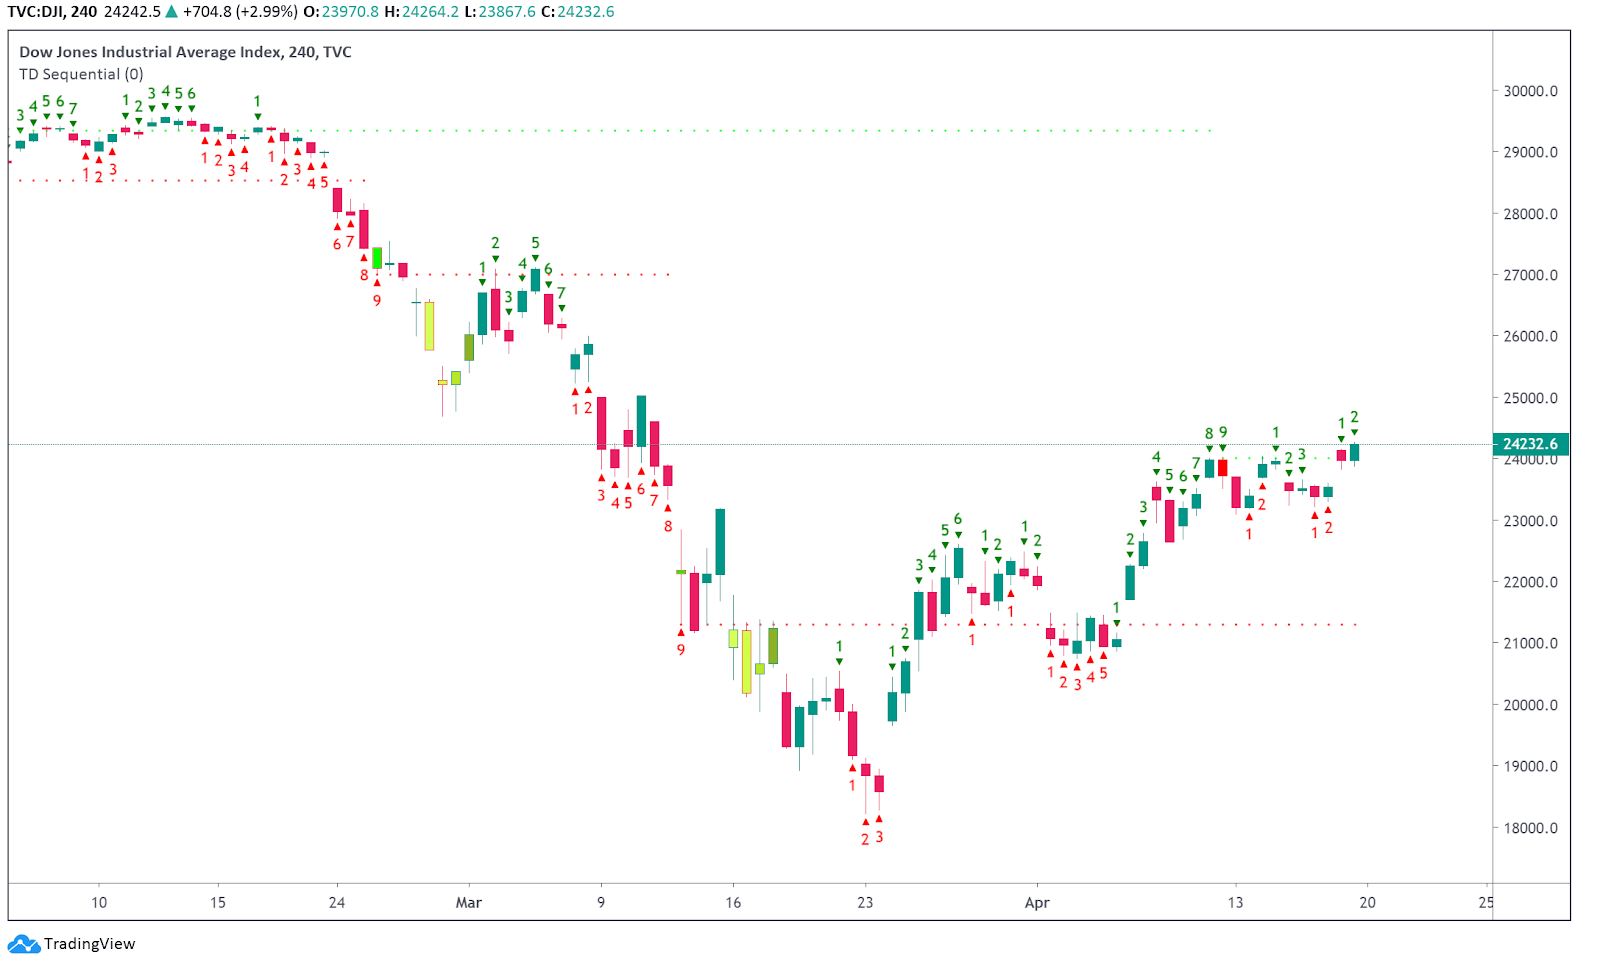 Dow Jones Industrial Average 4-hour chart prints TD9. Source: TradingView